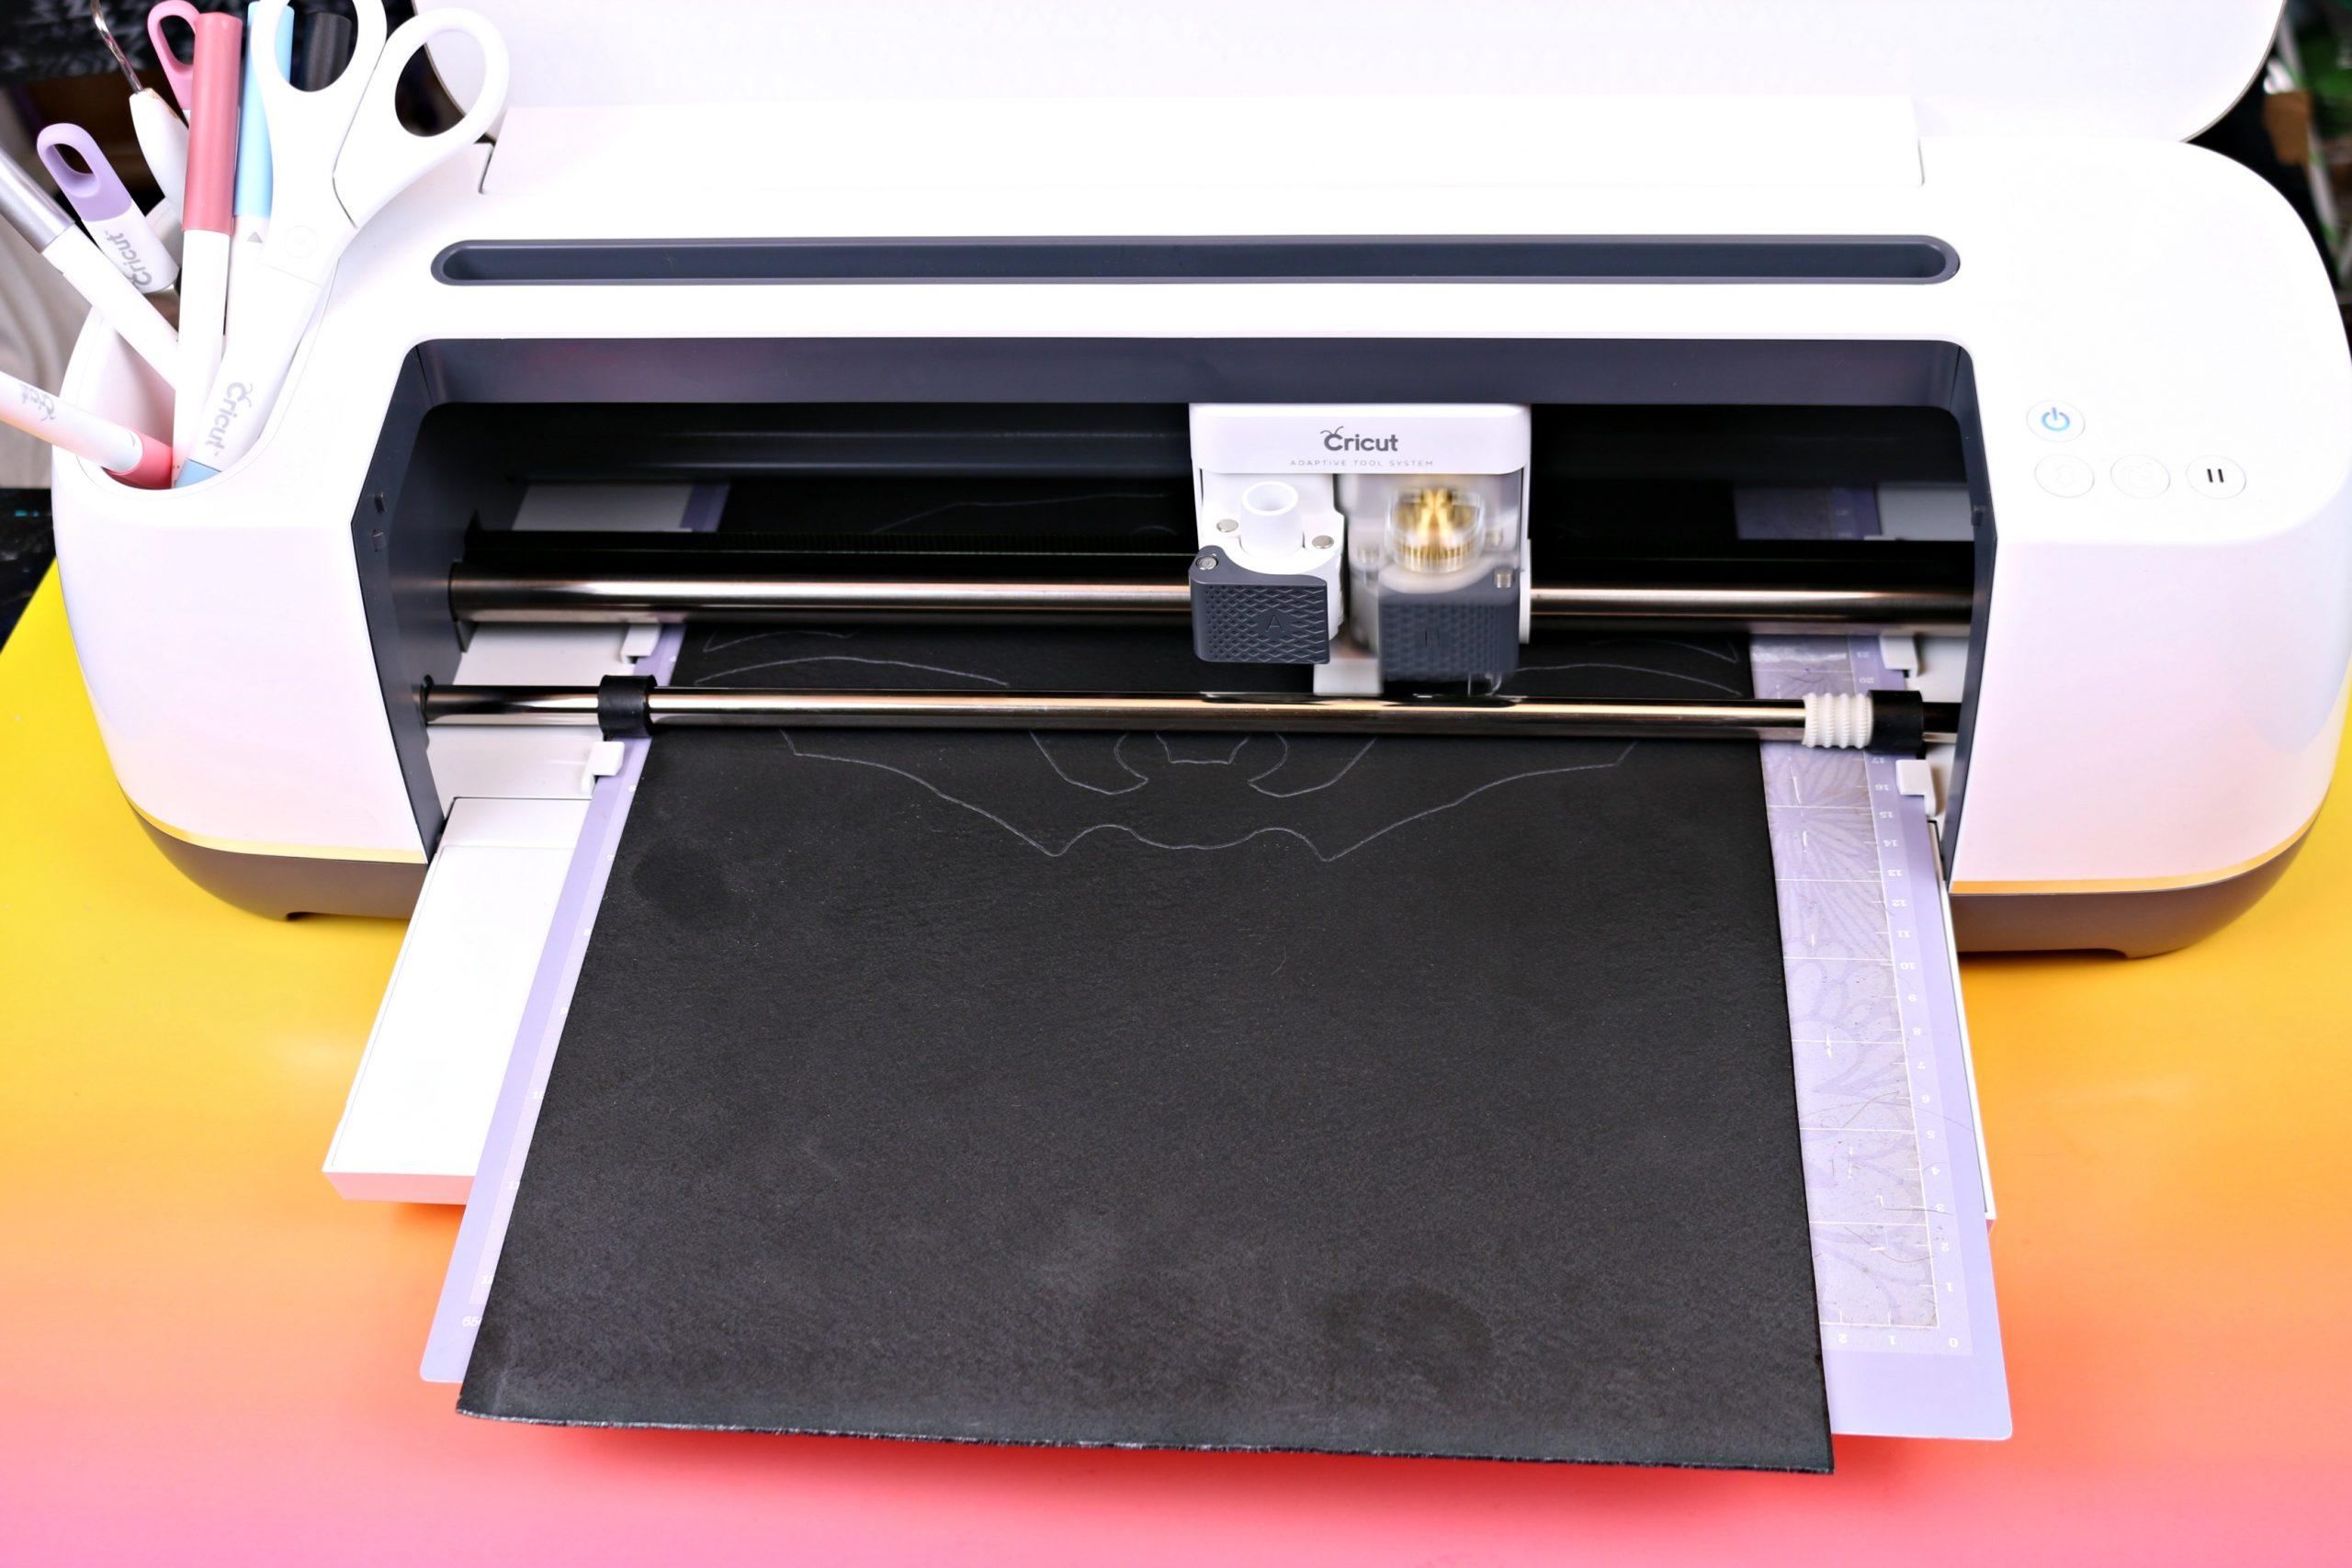 Cricut Maker cutting worlba plastic